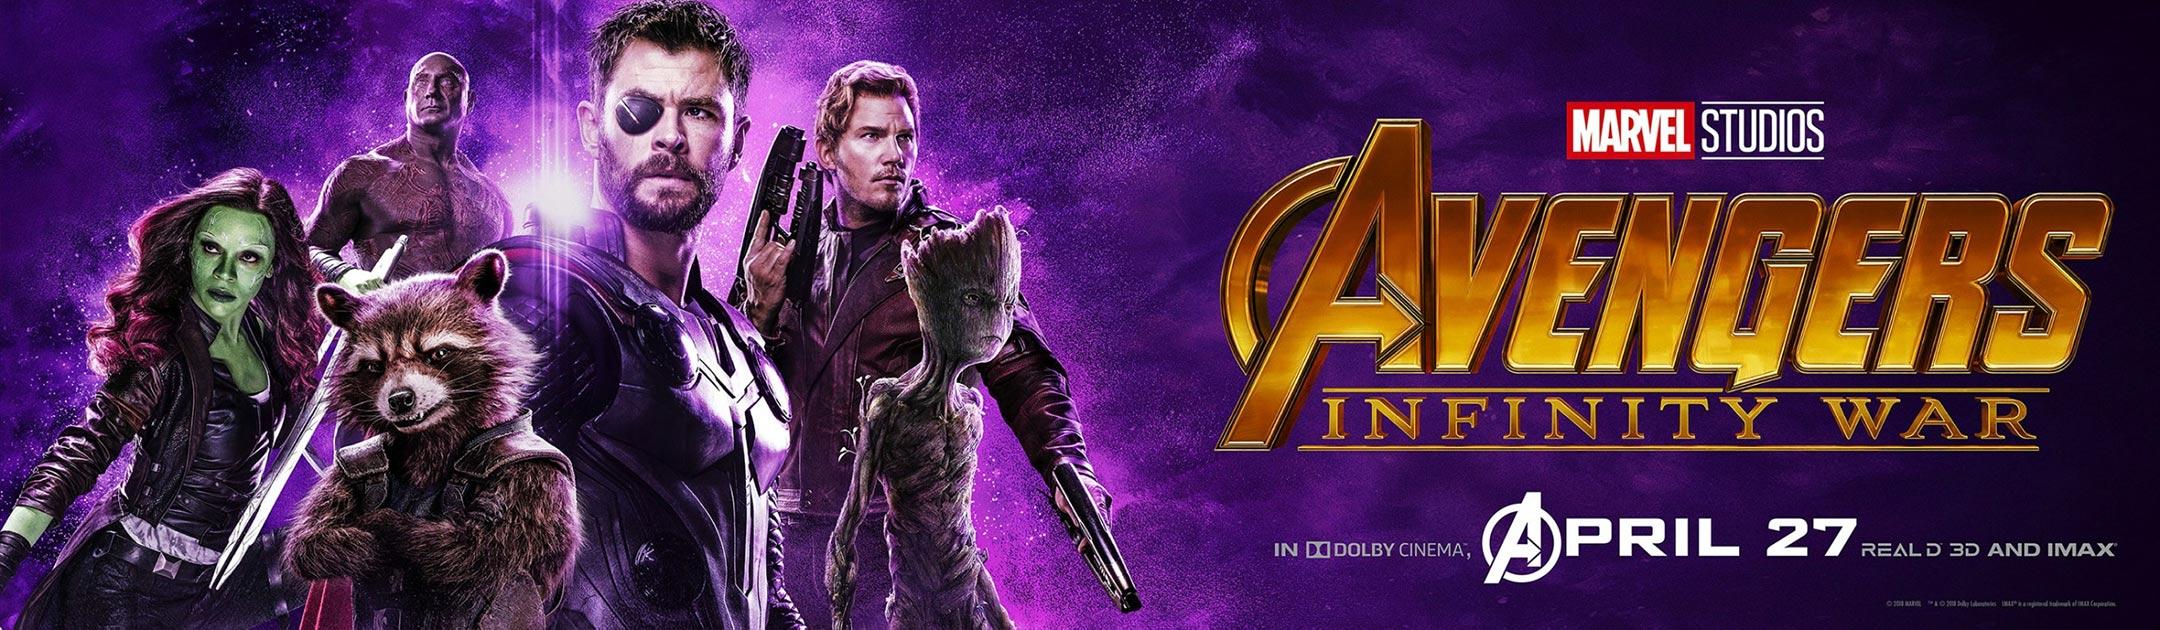 avengers infinity war 2018 poster 1 trailer addict